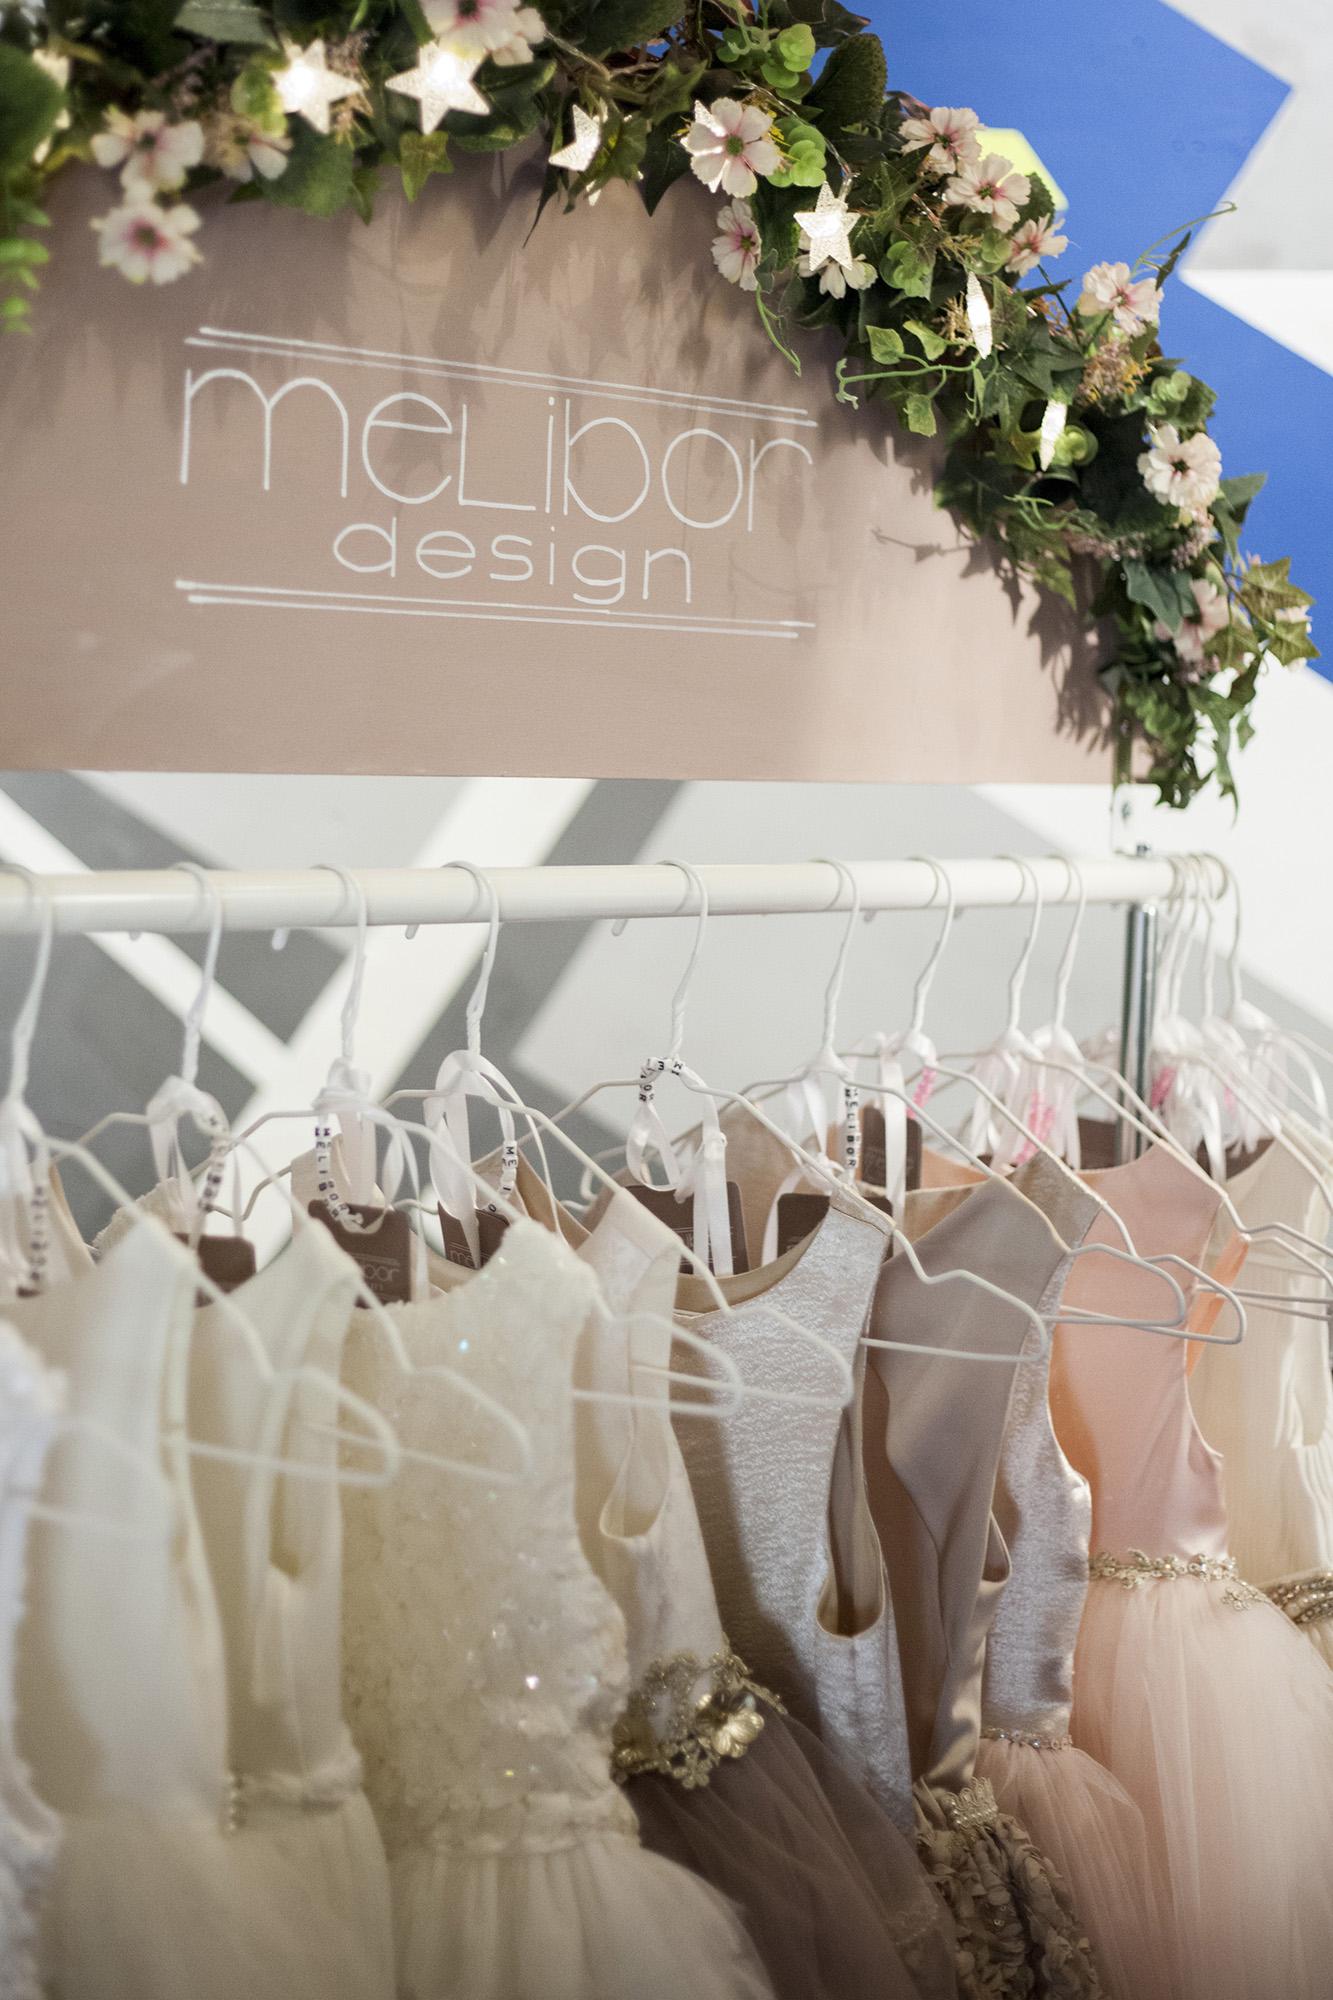 MeLibor Design - Fotó: HootPhoto